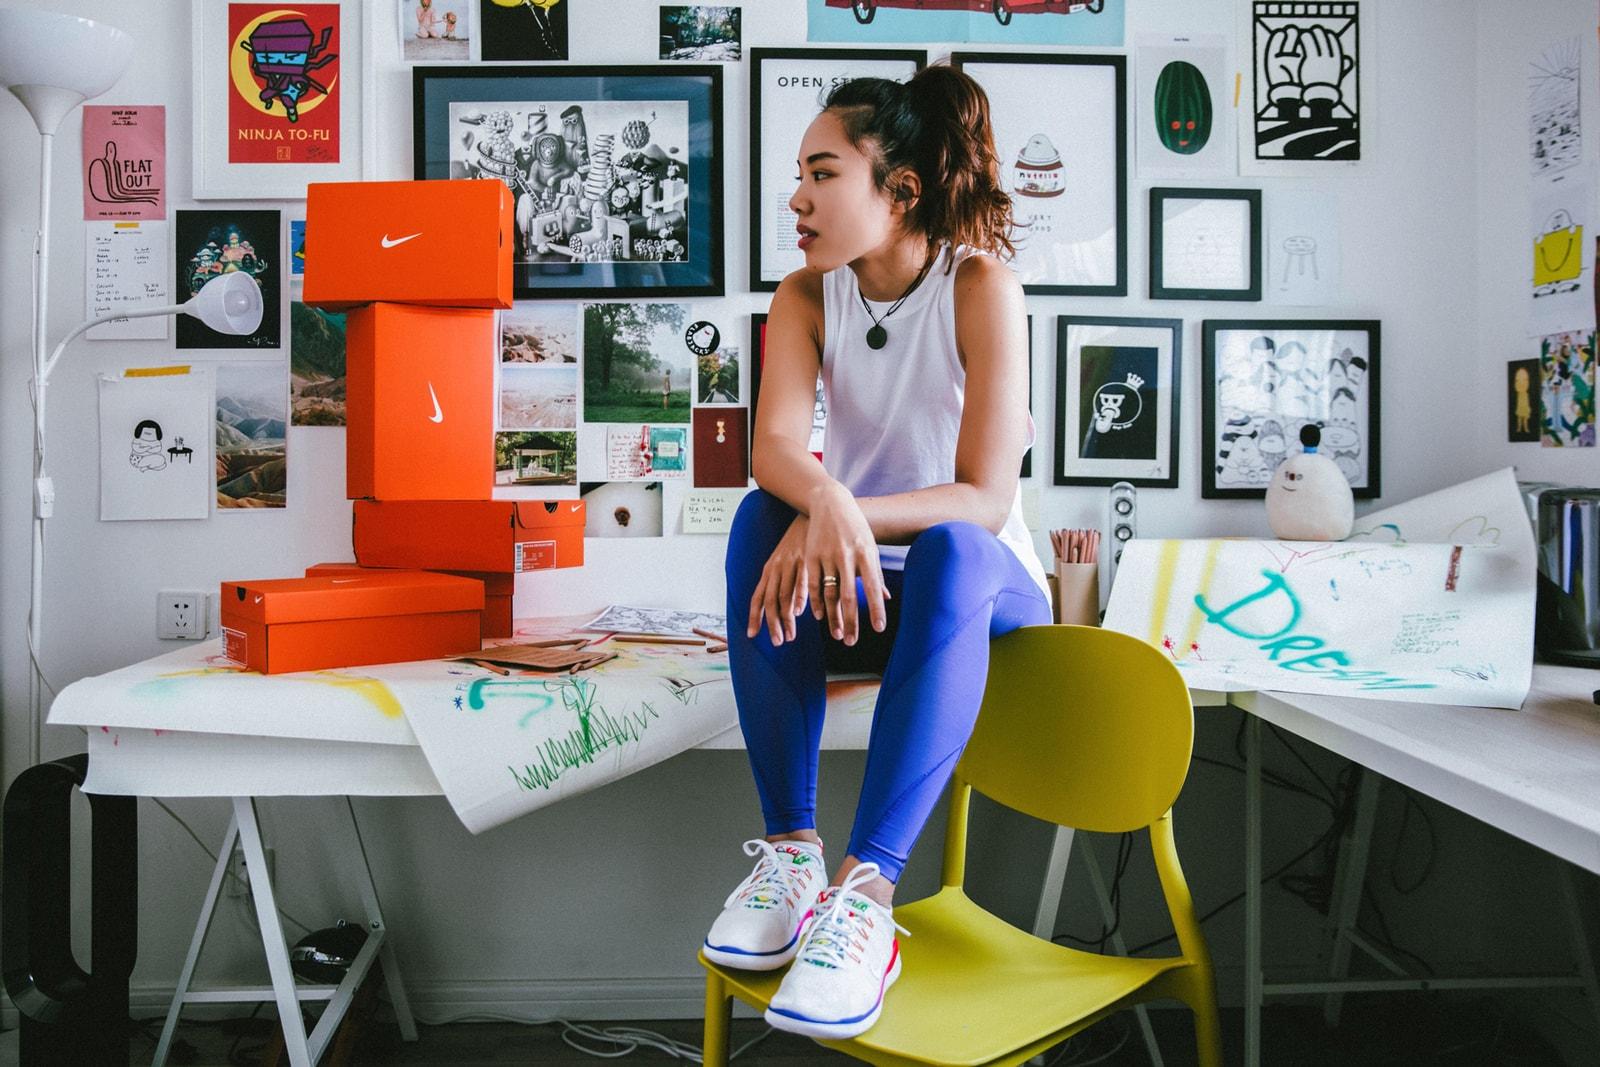 FLABJACKS Nike Free RN Expression Artist Series ton mak shanghai china sneaker shoe release hong kong release april 12